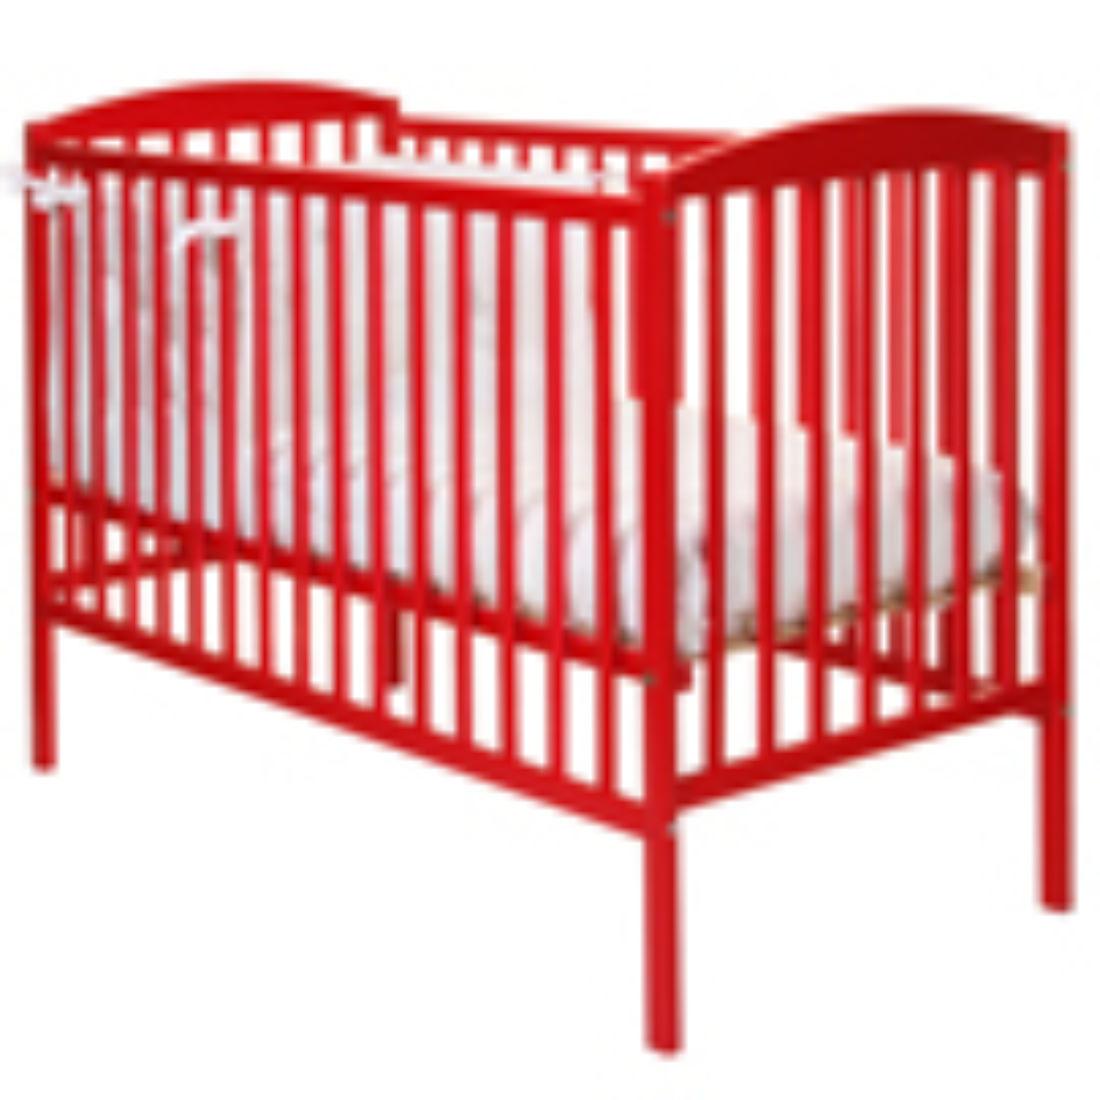 Mattress to fit Funky cot blue mattress size is 117 x